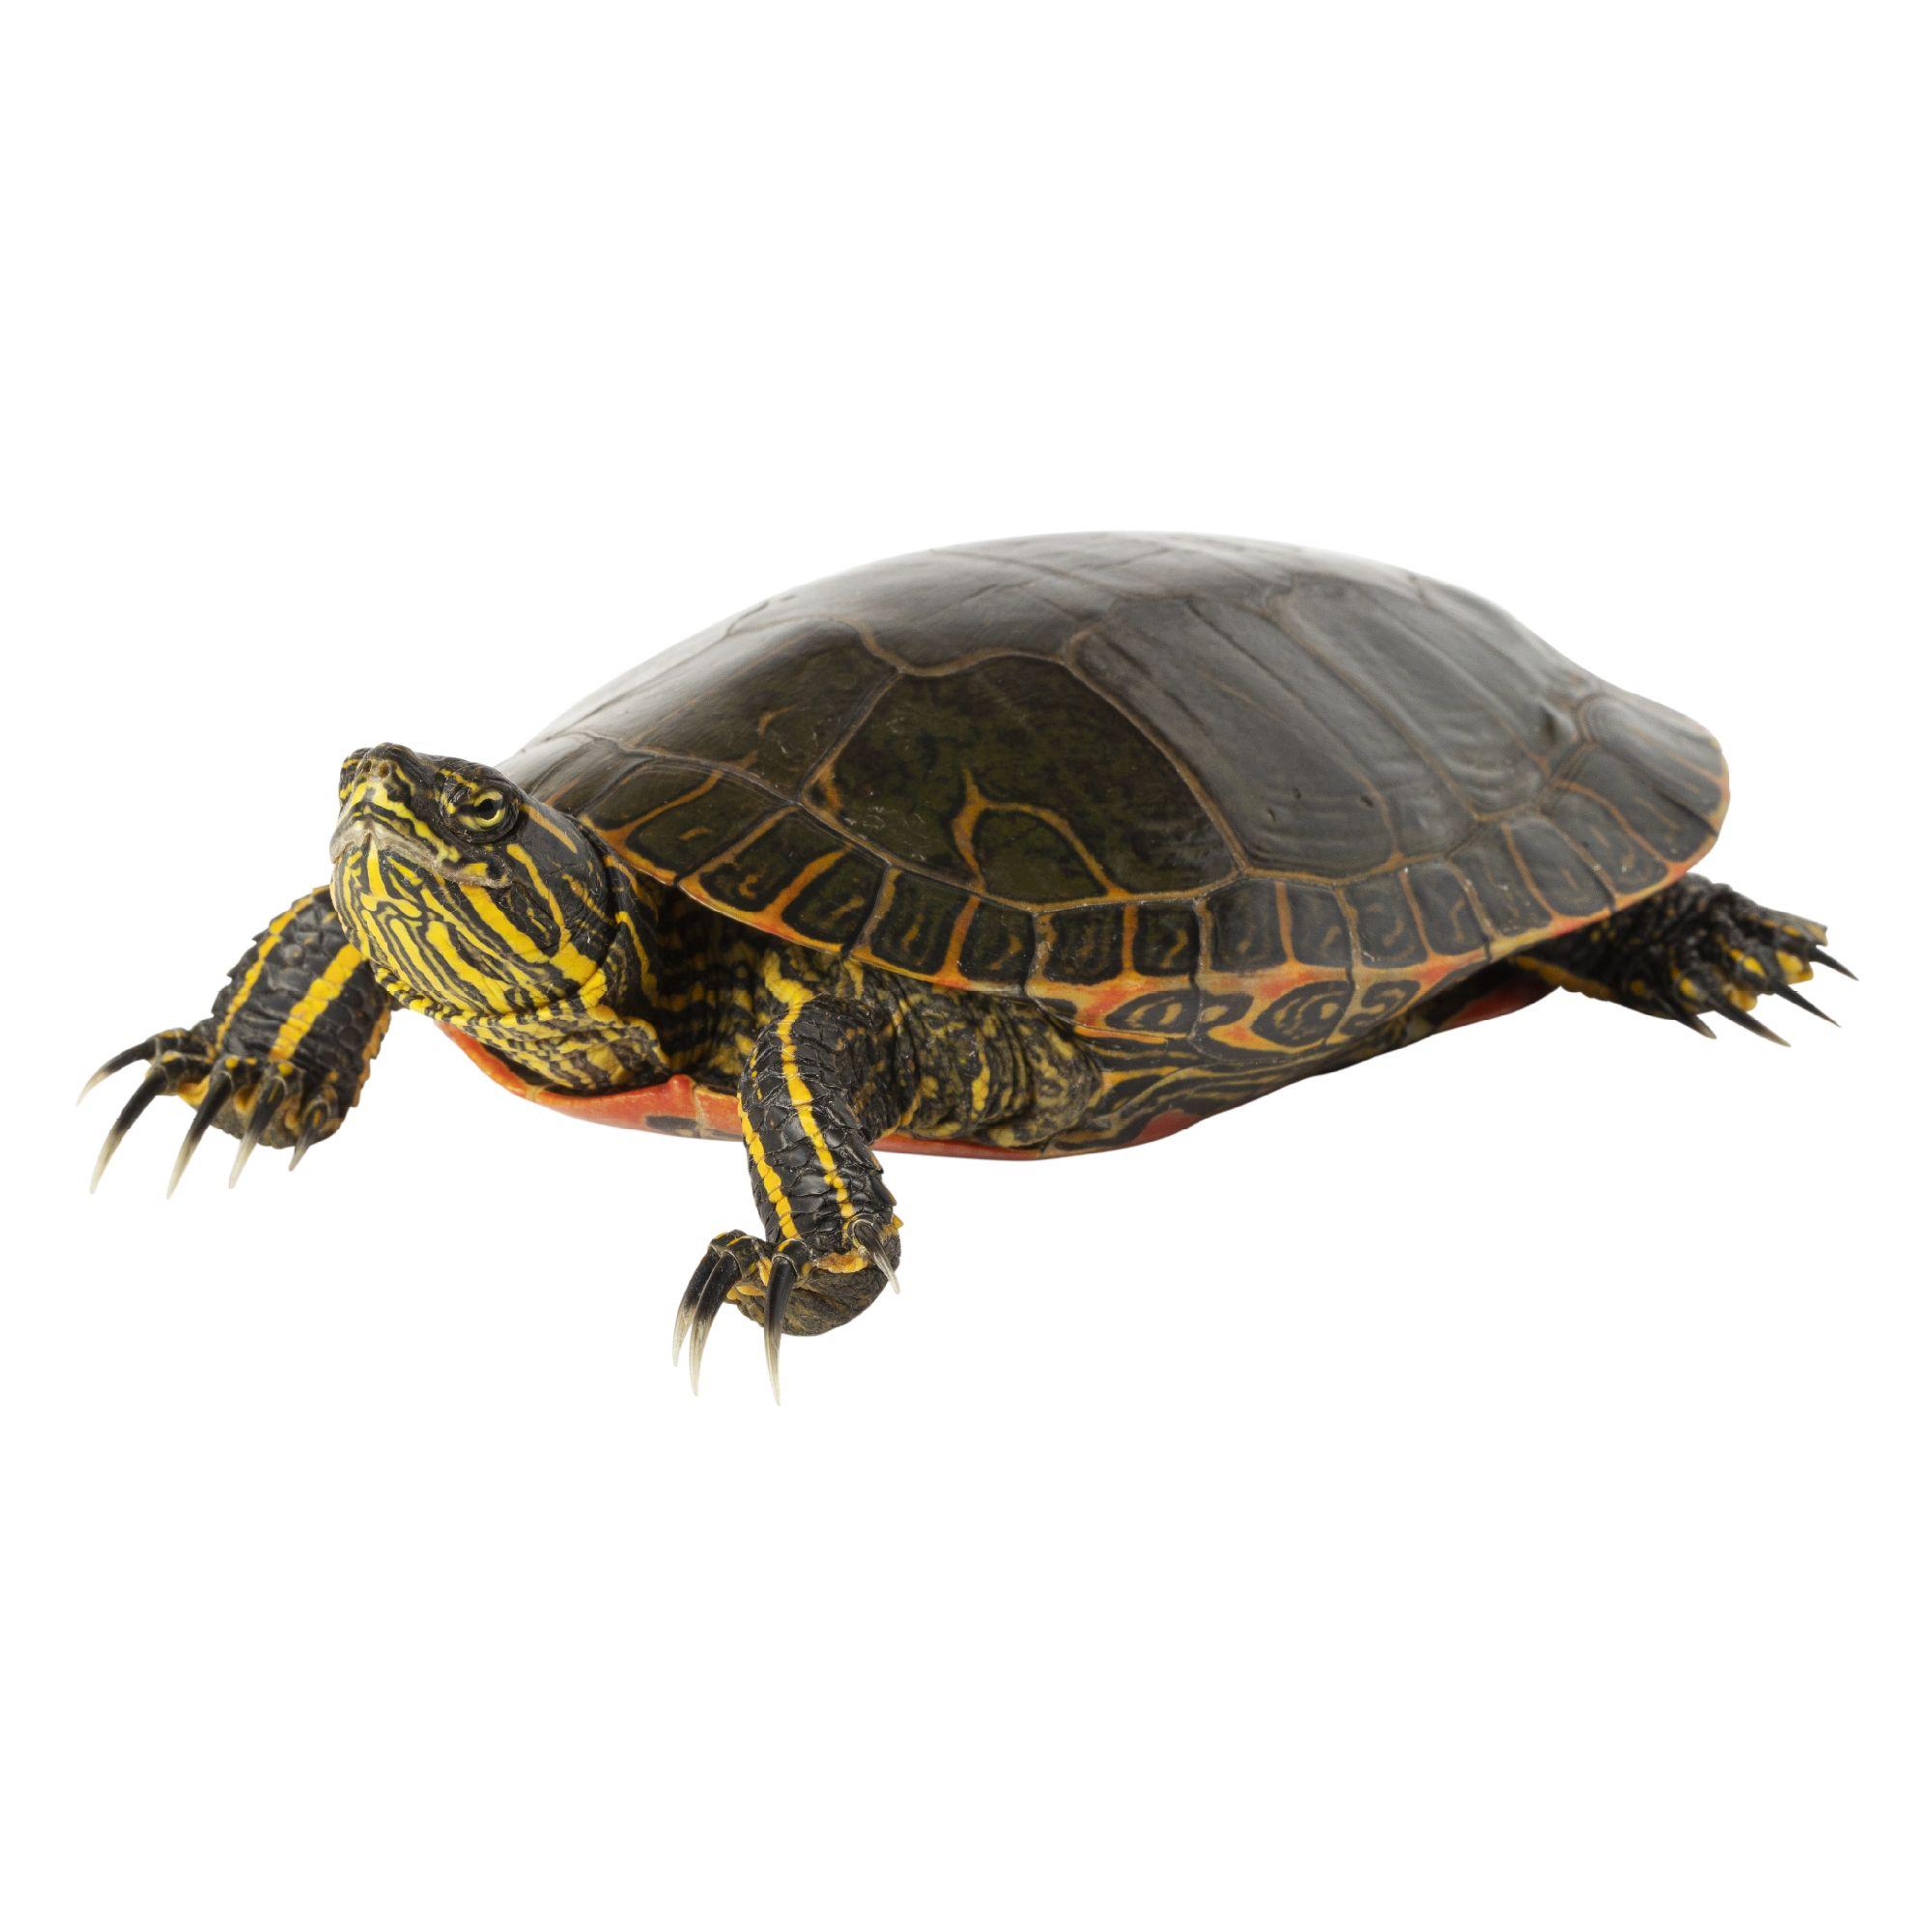 Painted Turtle For Sale Live Pet Reptiles Petsmart